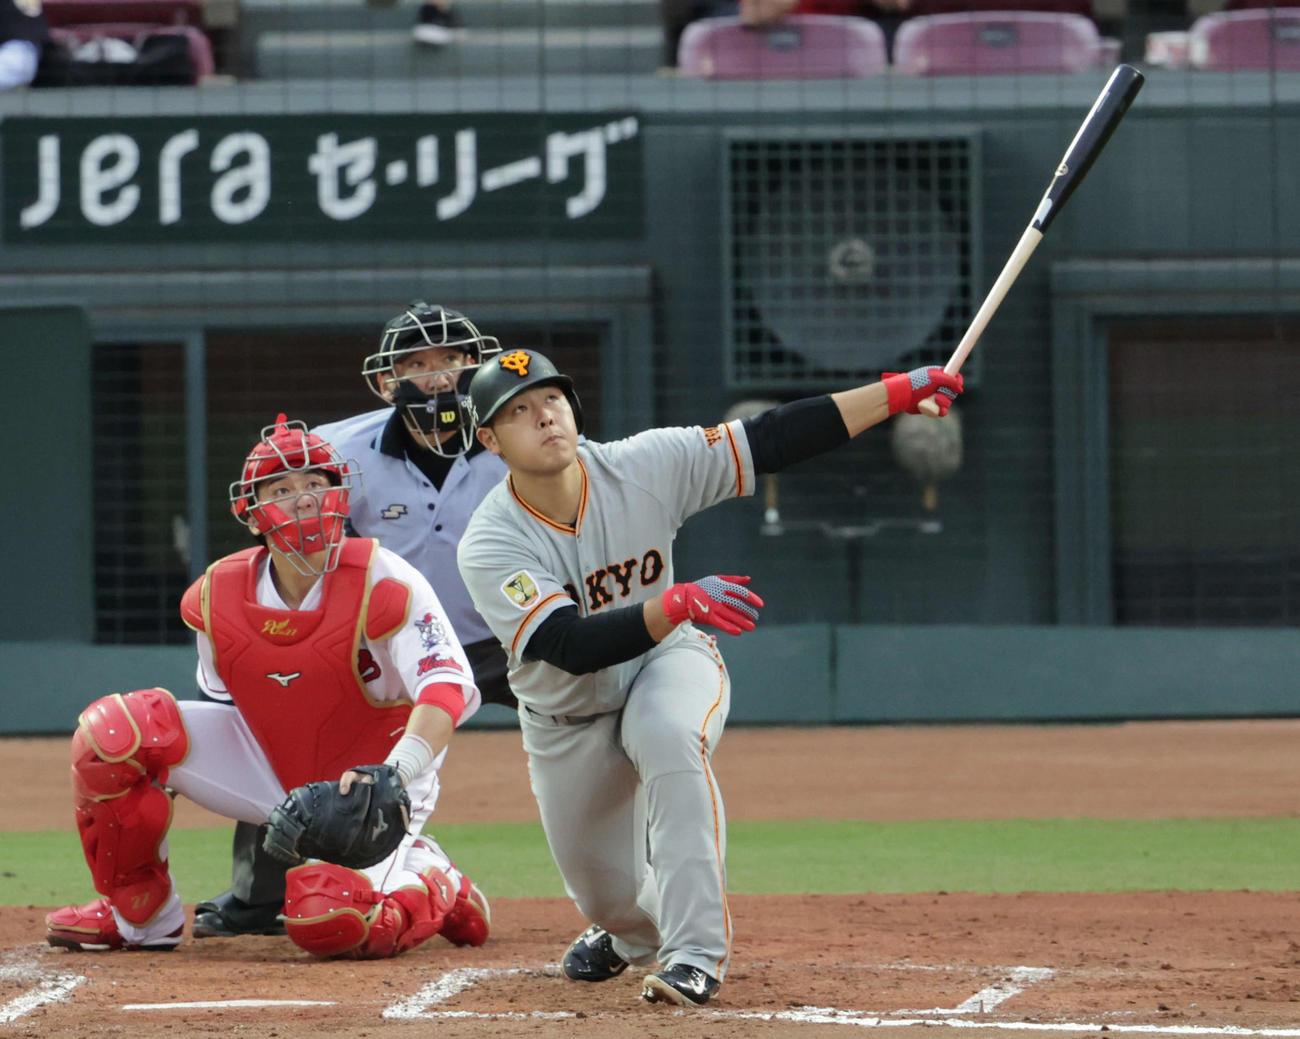 広島対巨人4回戦 3回表巨人1死二、三塁、岡本は左越え3点本塁打を放つ(撮影・加藤孝規)